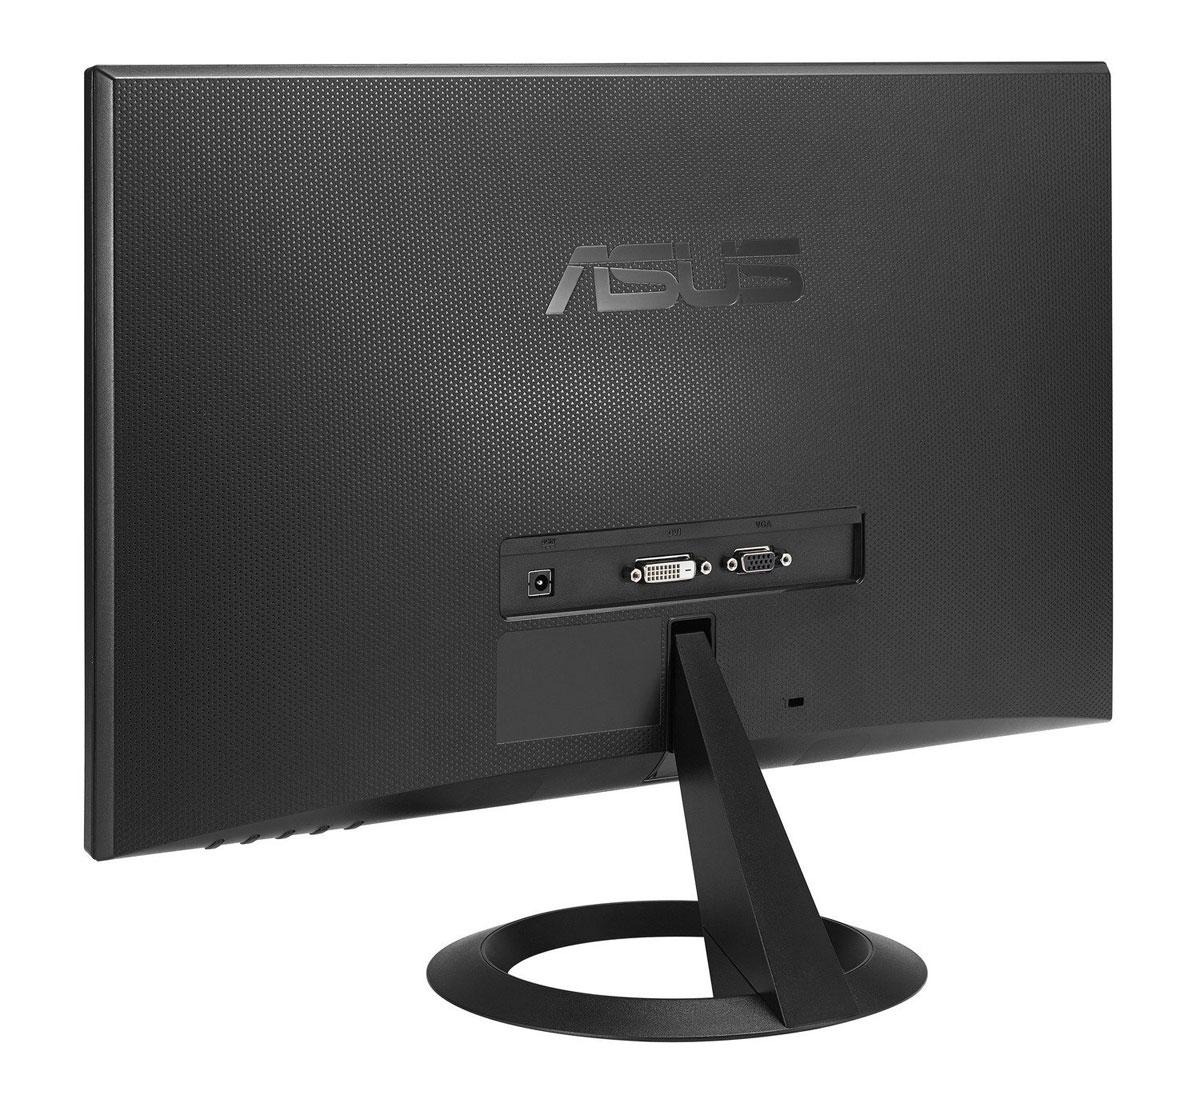 Asus VX207NE монитор ( 90LM00Y1-B02370 )